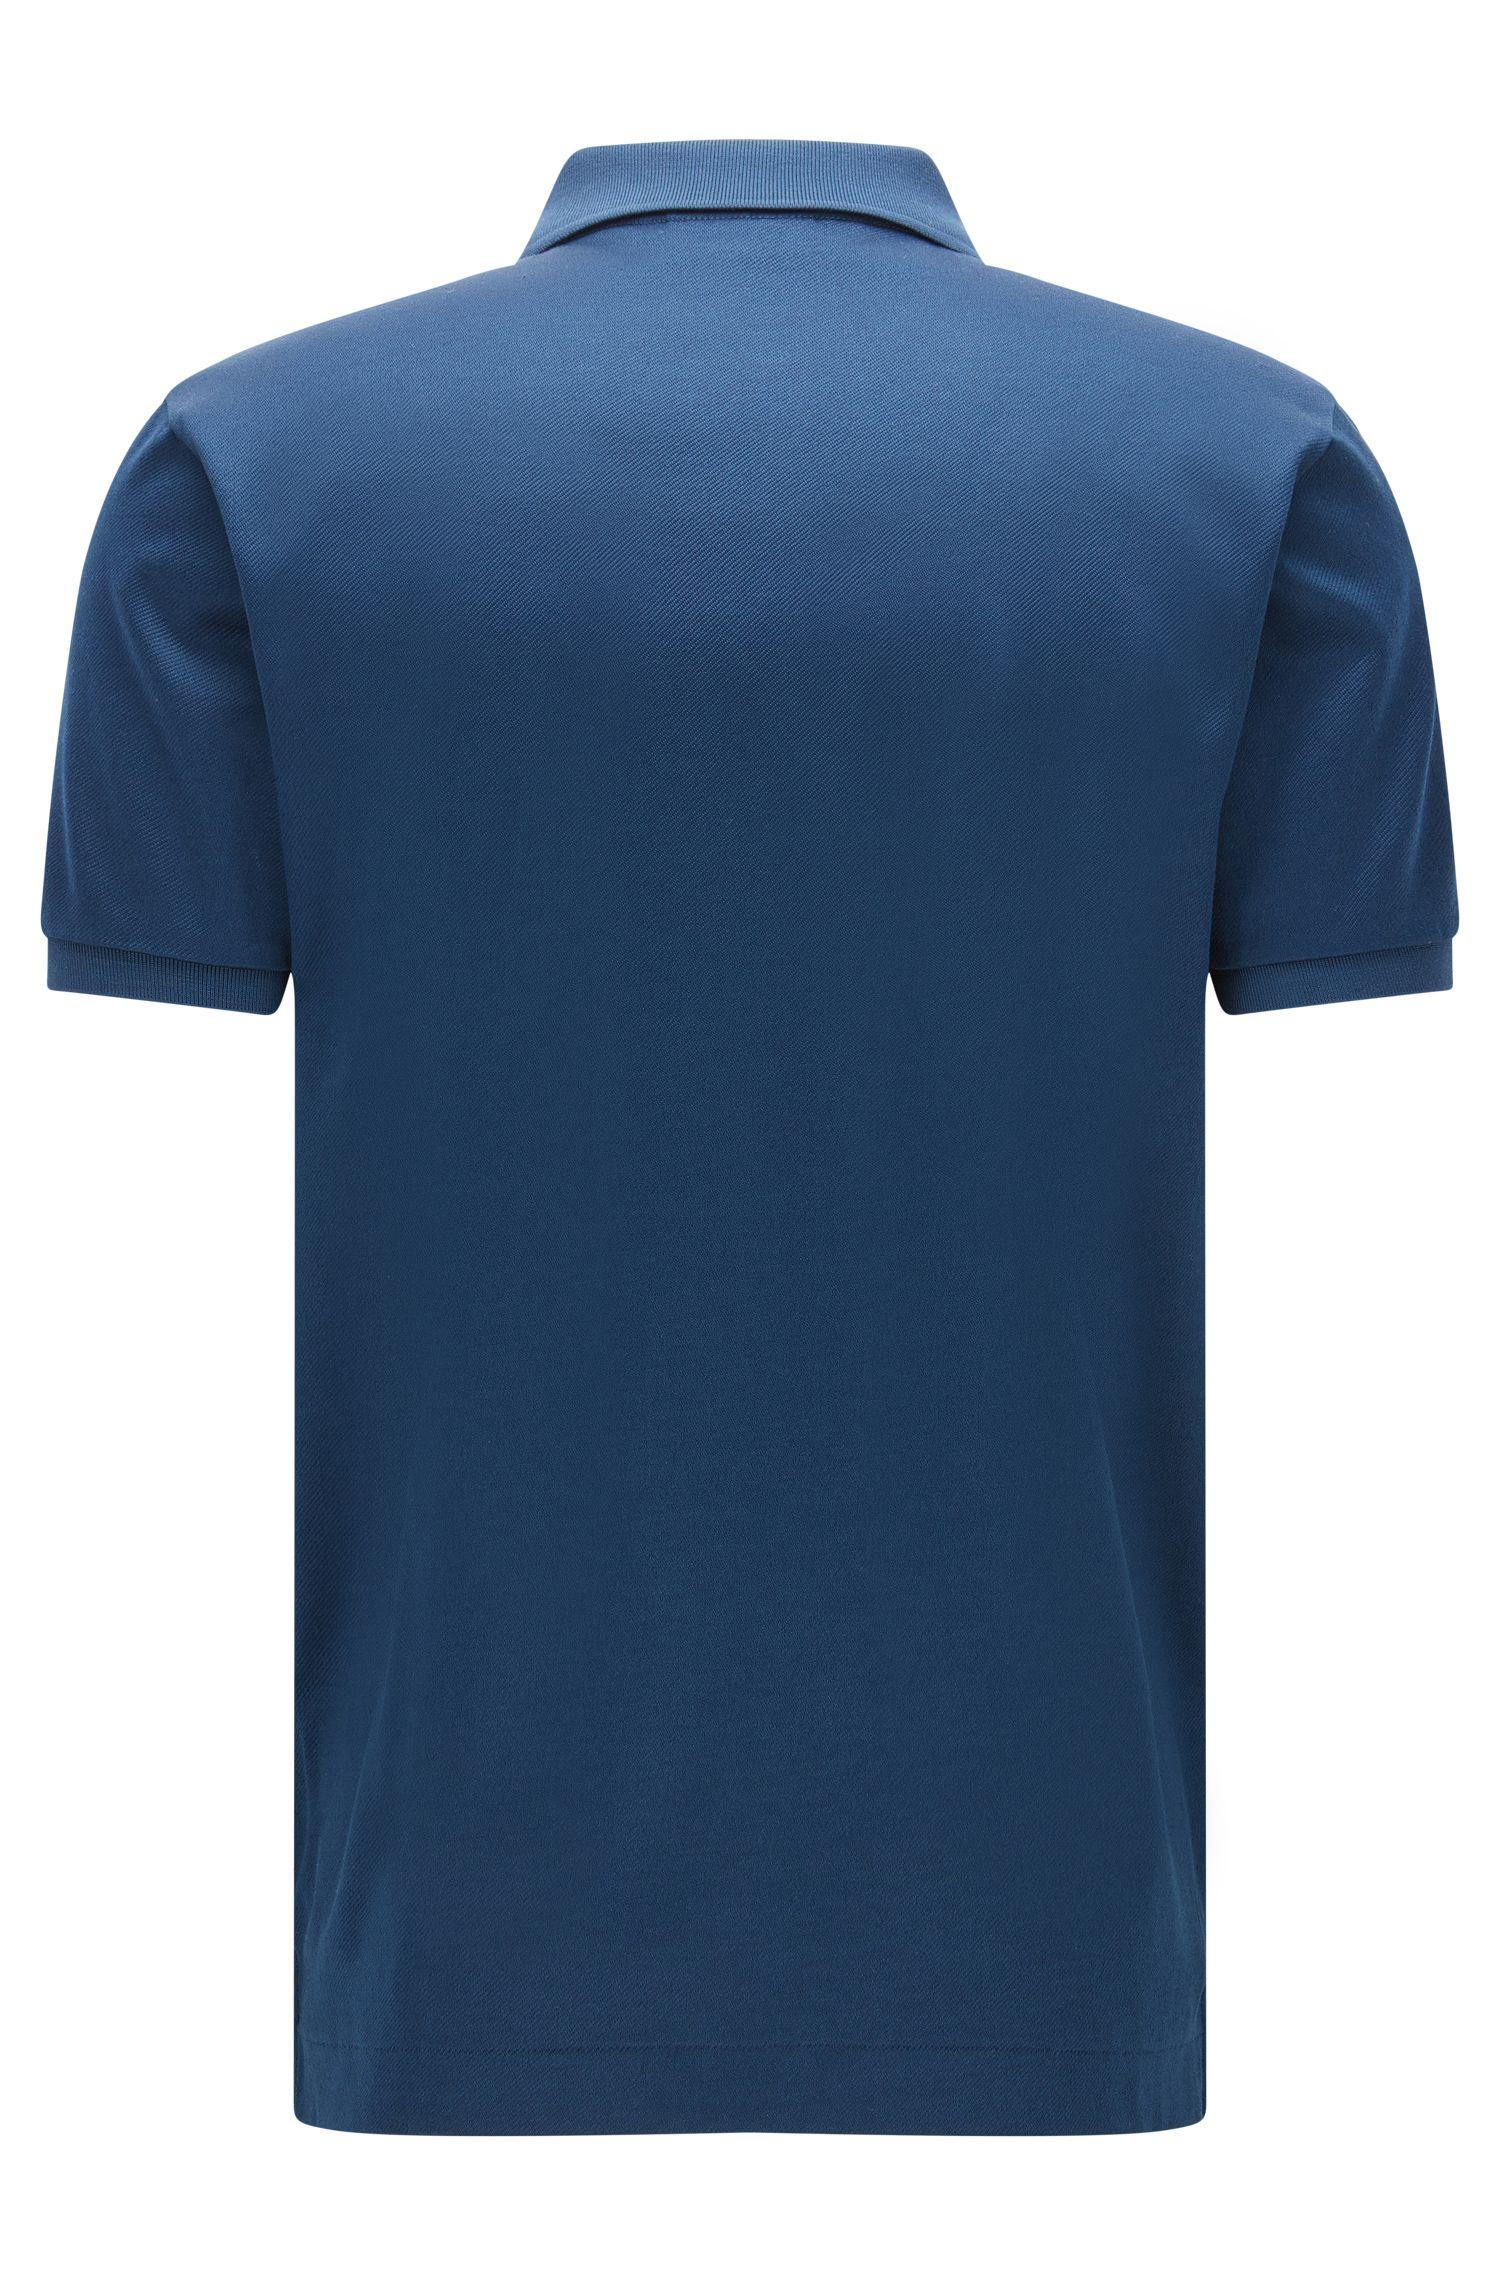 Mercerized Cotton Twill Polo Shirt, Regular Fit | Digato, Dark Blue